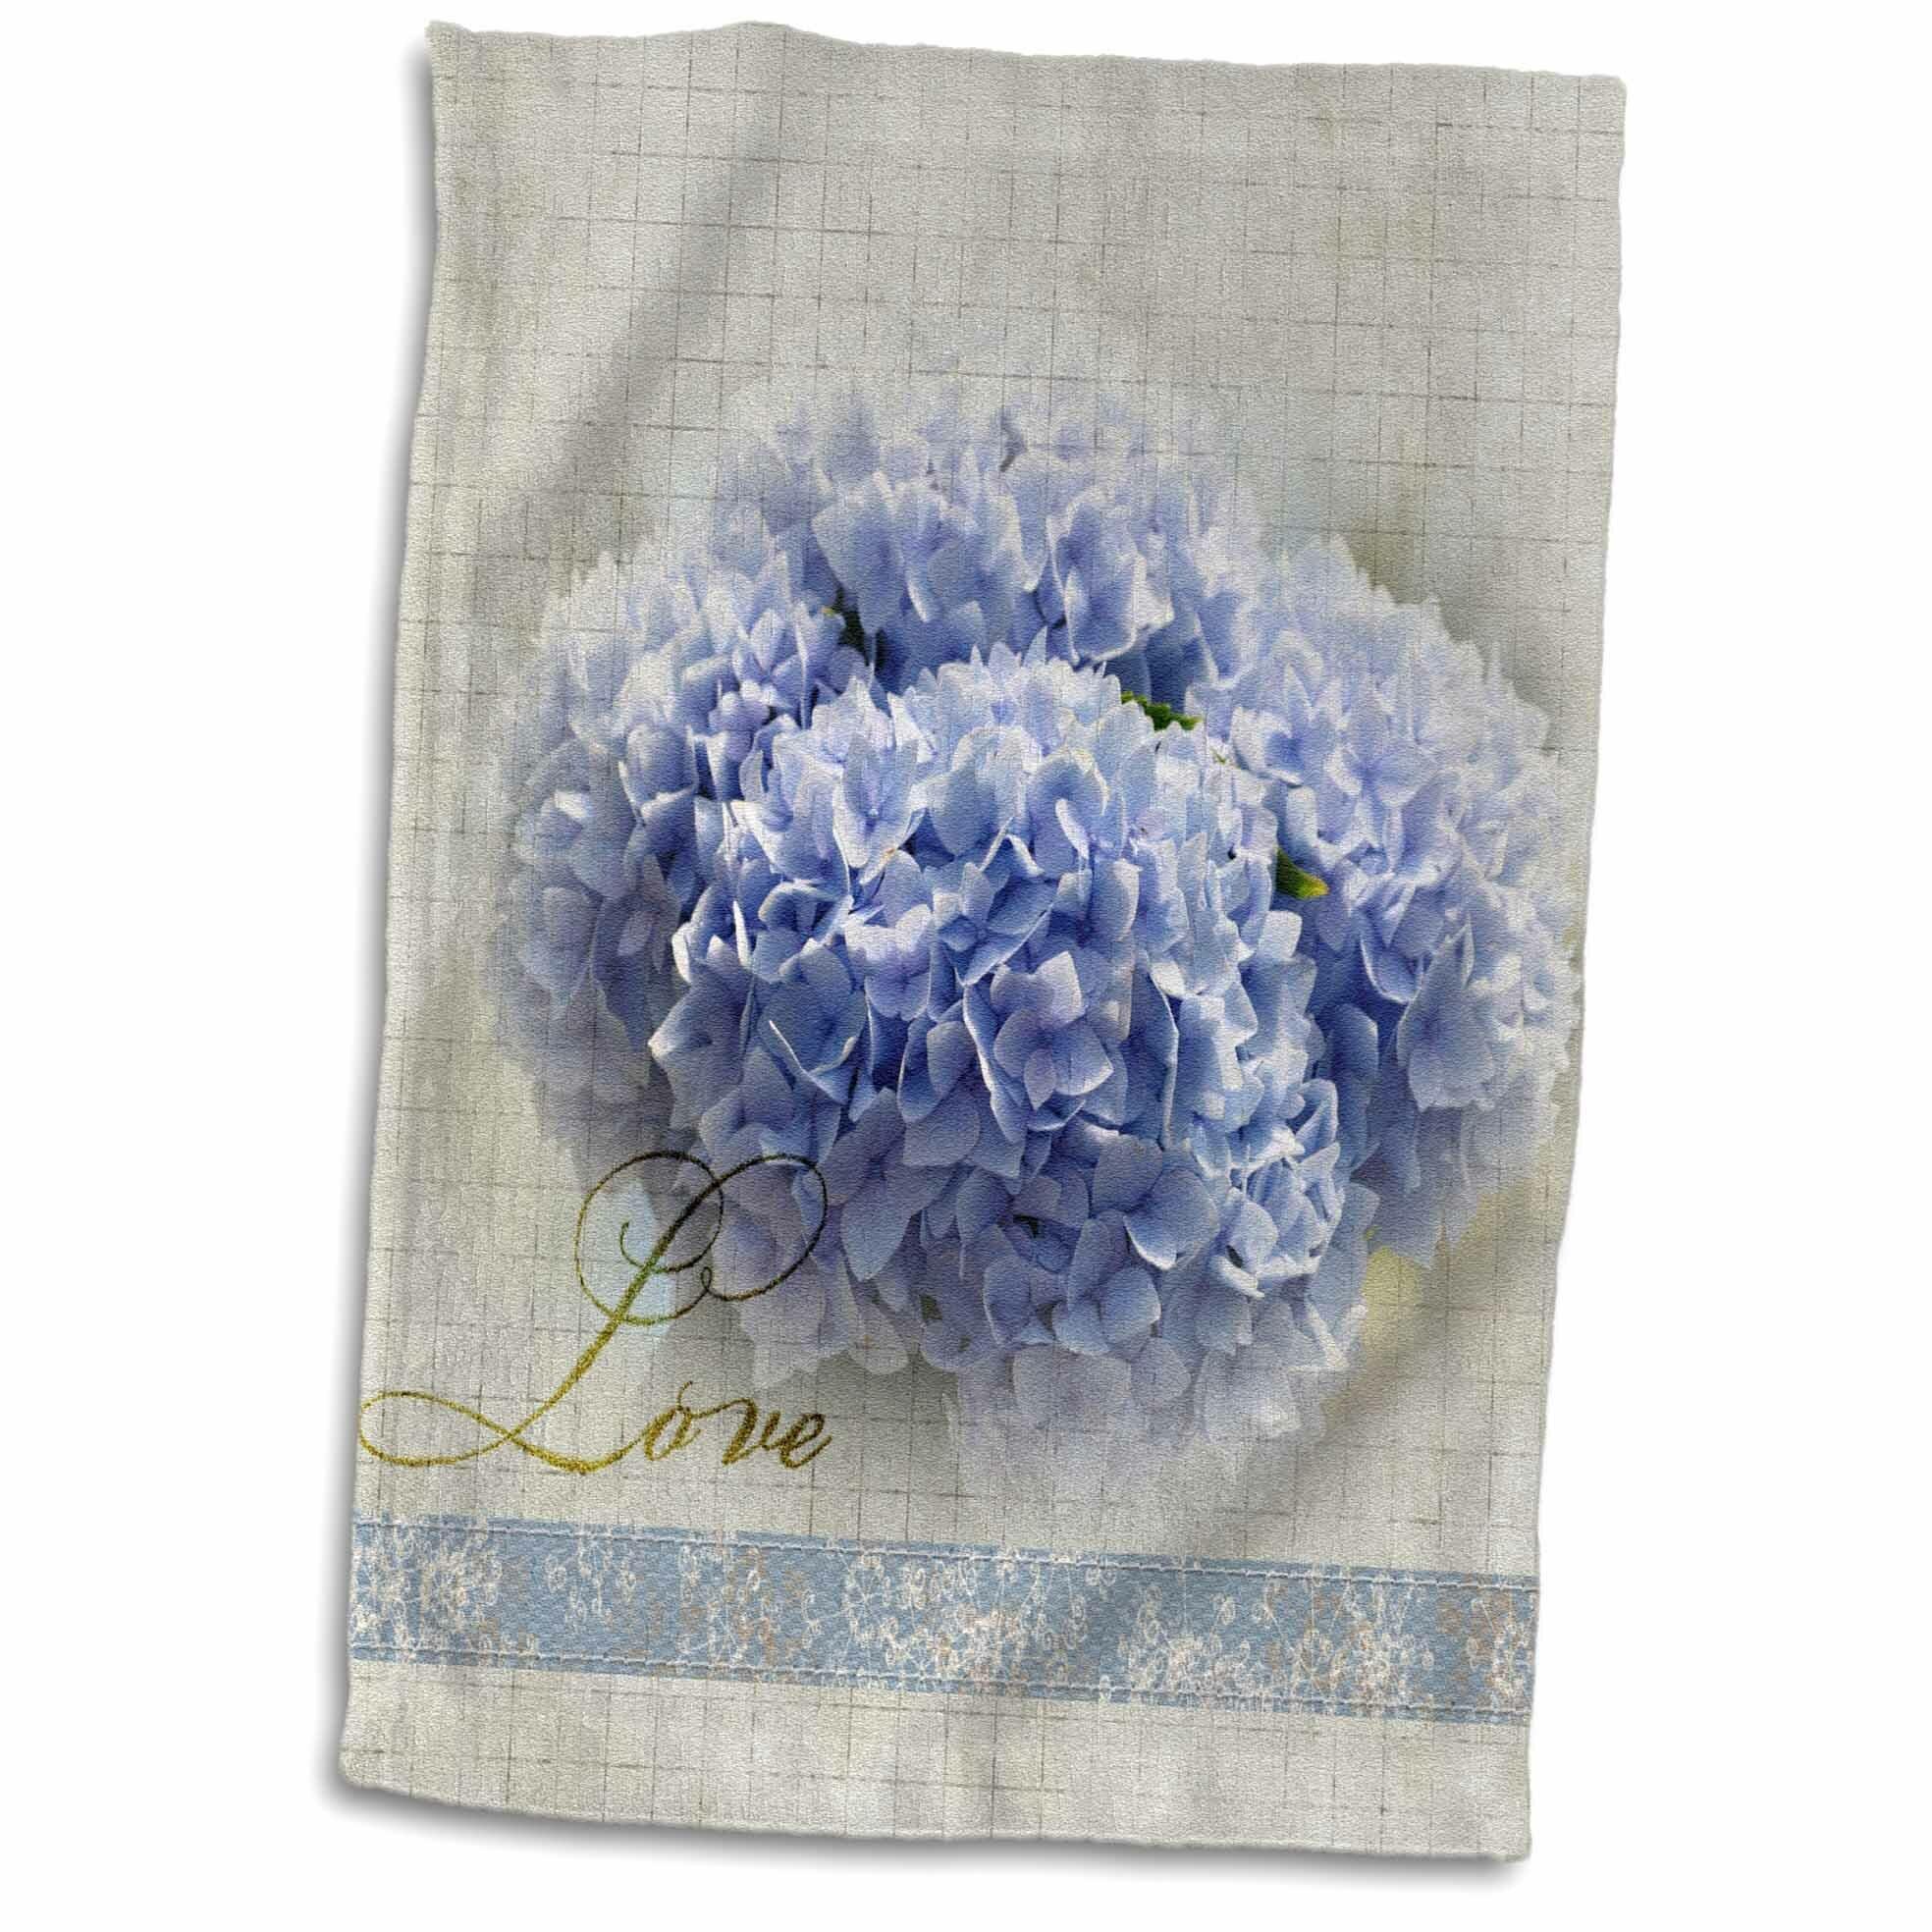 Symple Stuff Merkel Hydrangea Flowers Hand Towel Wayfair